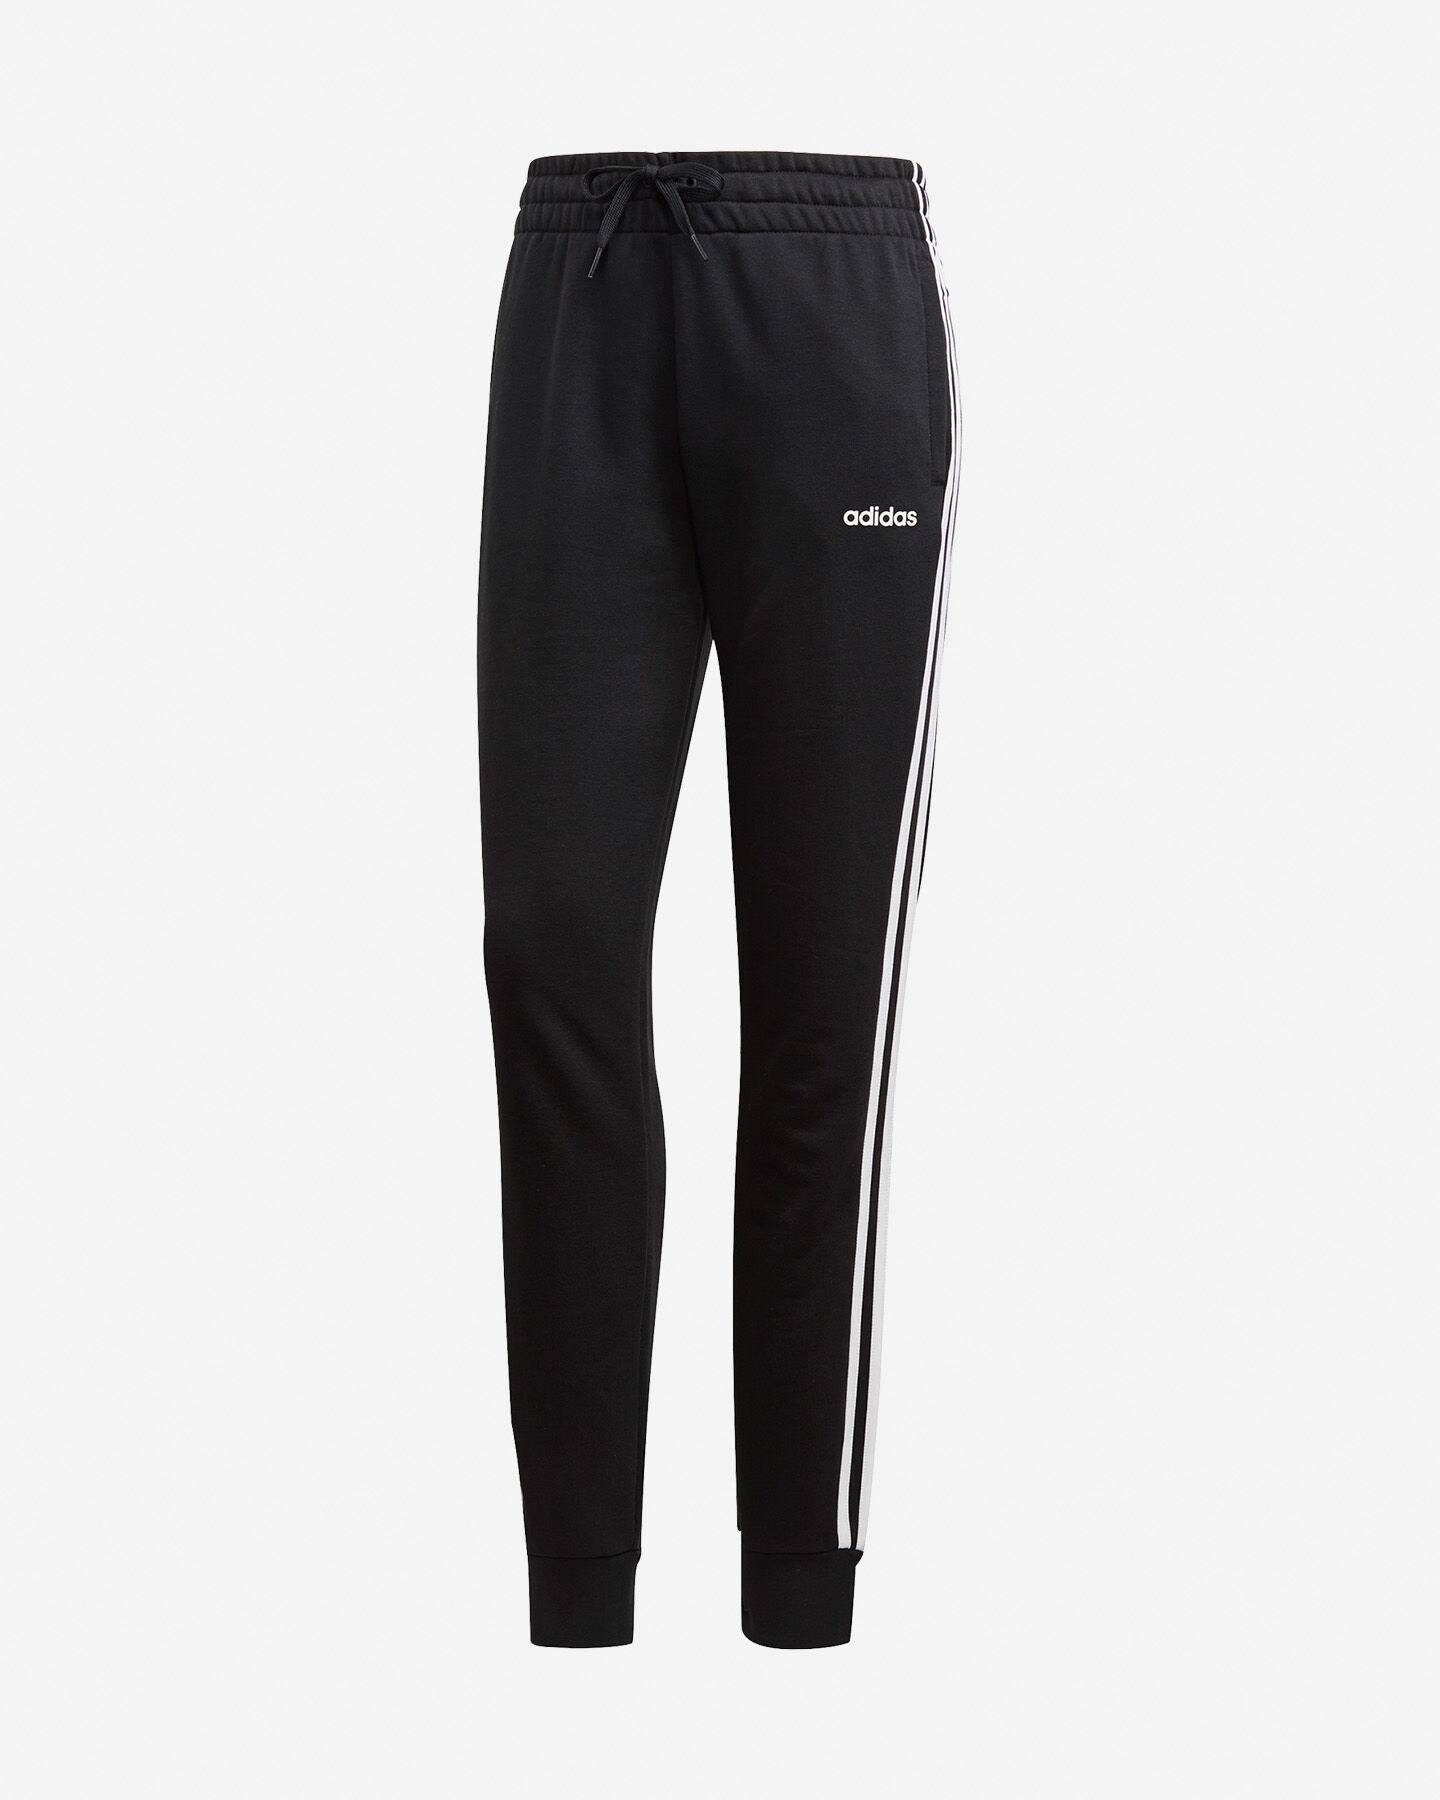 Pantalone ADIDAS ESSENTIALS 3 STRIPES W S4056301 scatto 4